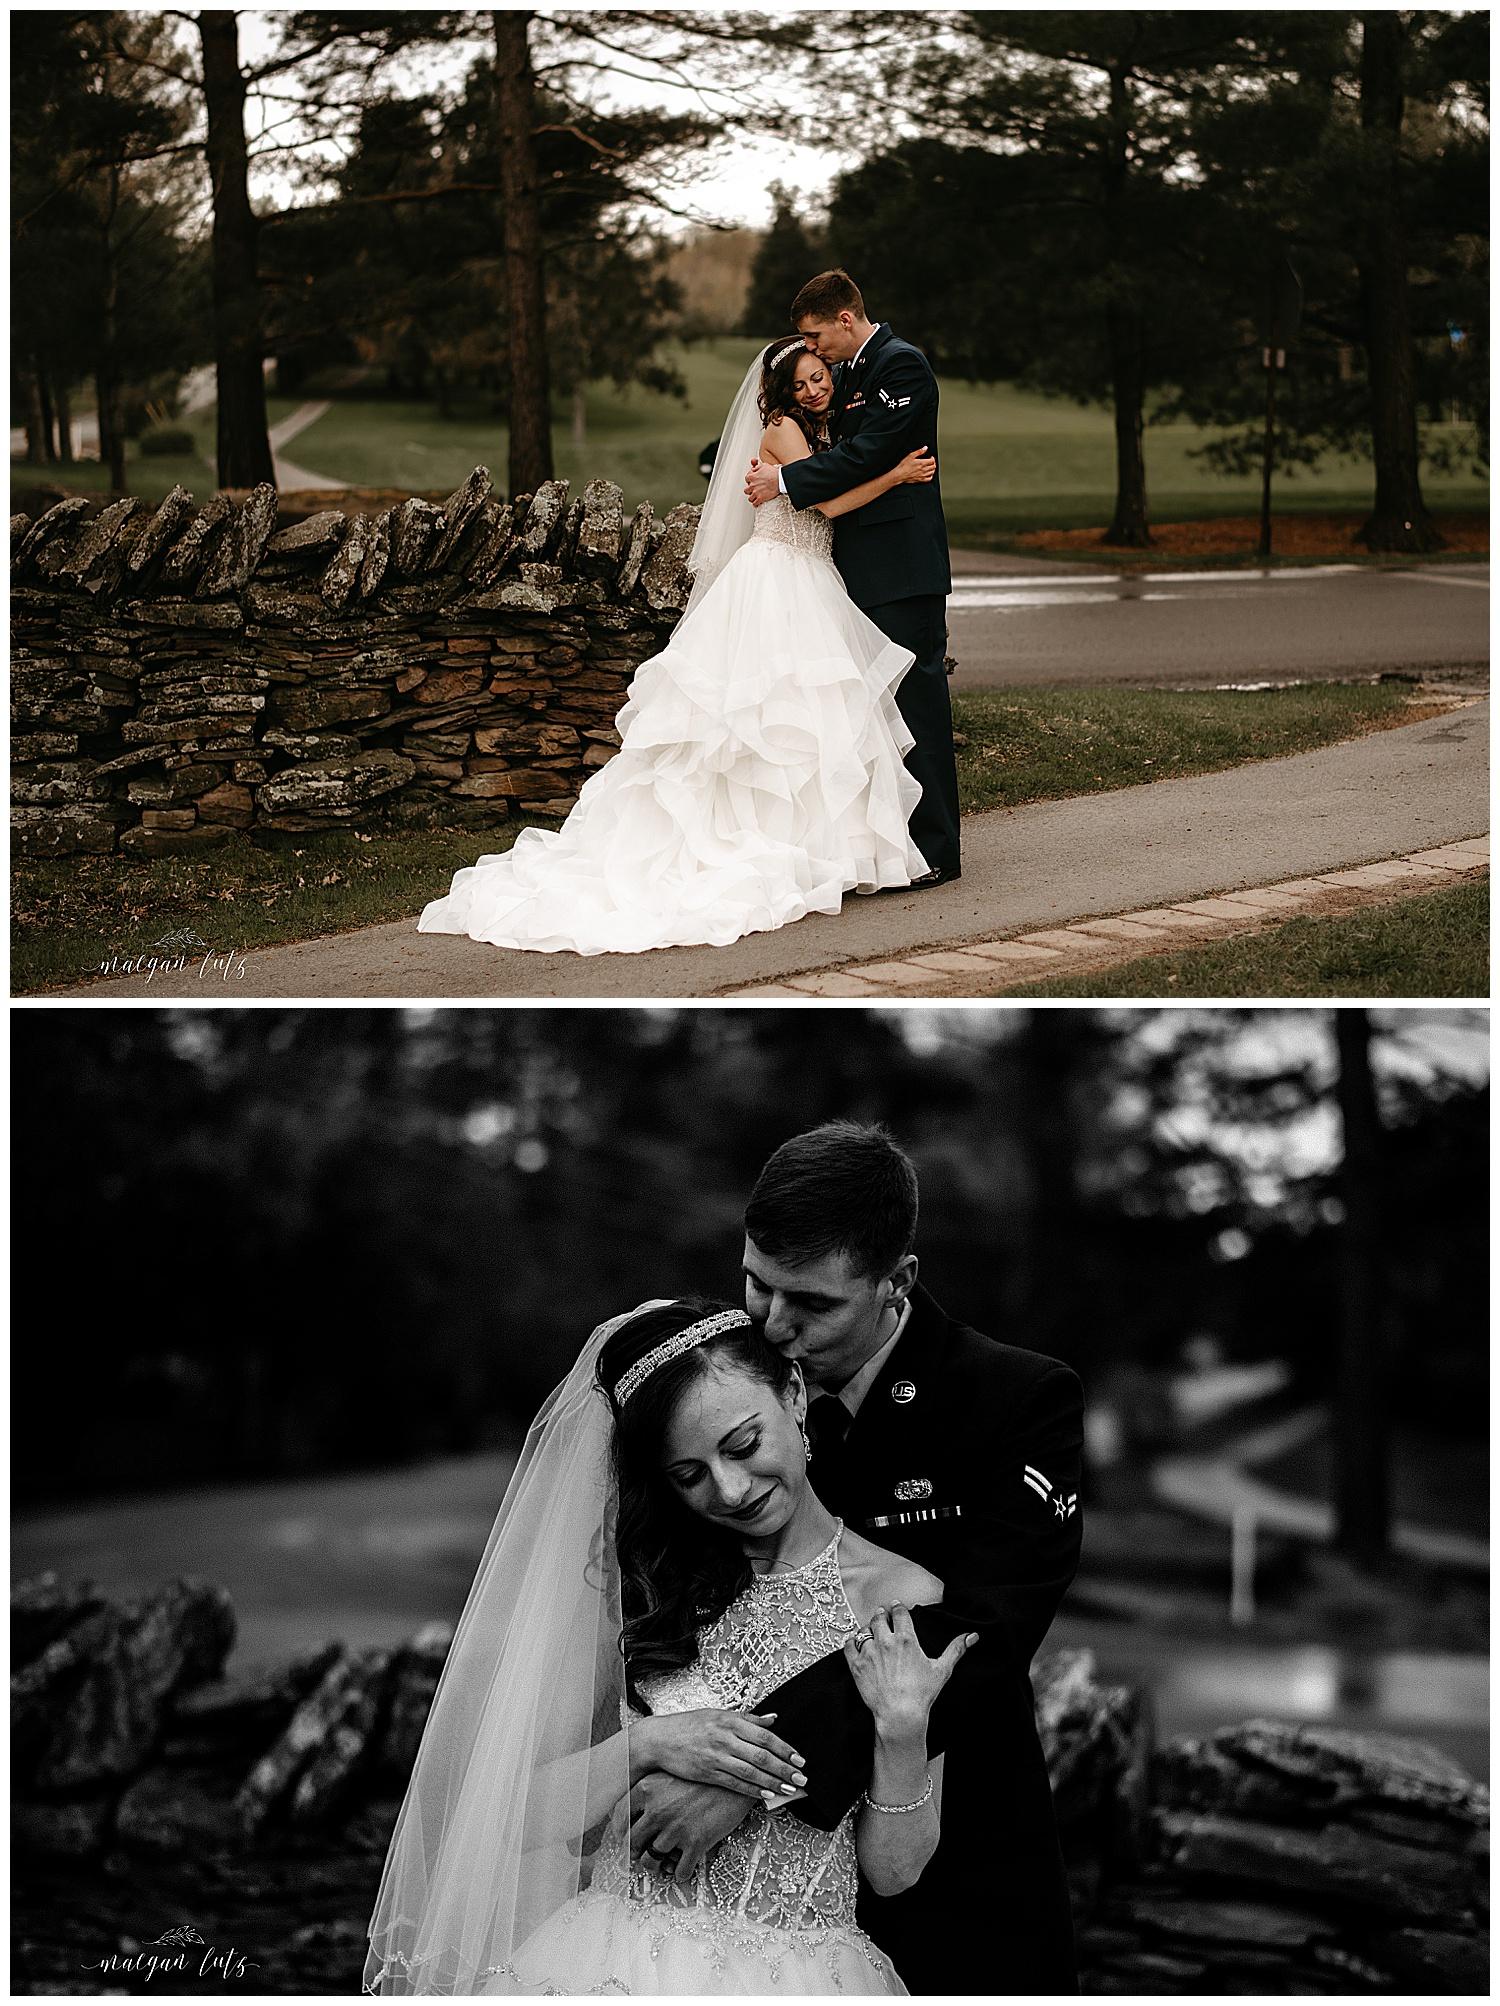 NEPA-Lehigh-Valley-Wedding-Photographer-at-Glen-Oak-Country-Club-Clarks-Summit-PA_0030.jpg